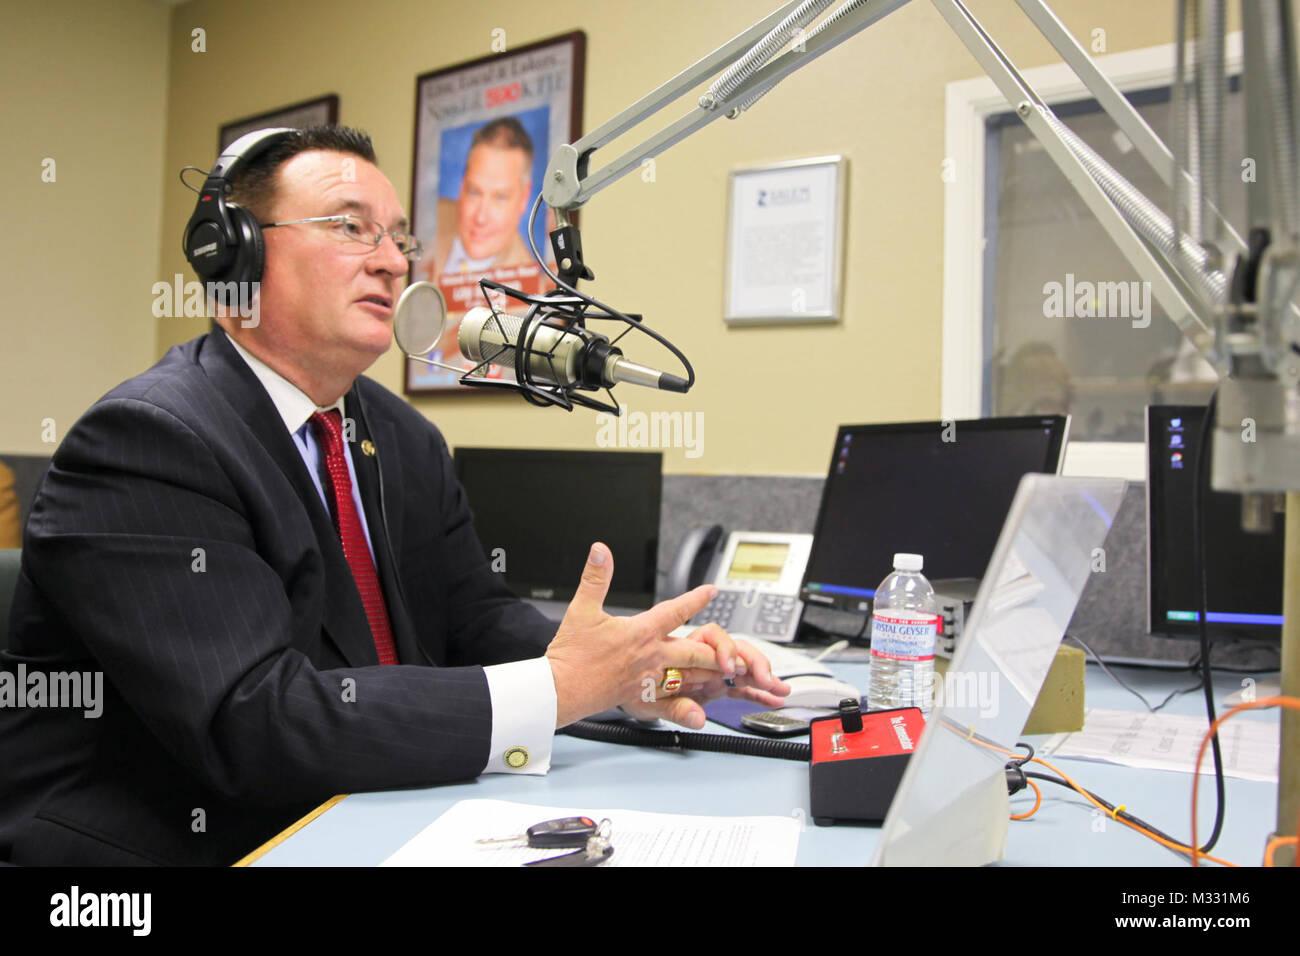 140408-N-BA377-007 SAN BERNARDINO, Calif. (April 8, 2014) Thomas Freeman, commissioner of Riverside County's Office - Stock Image